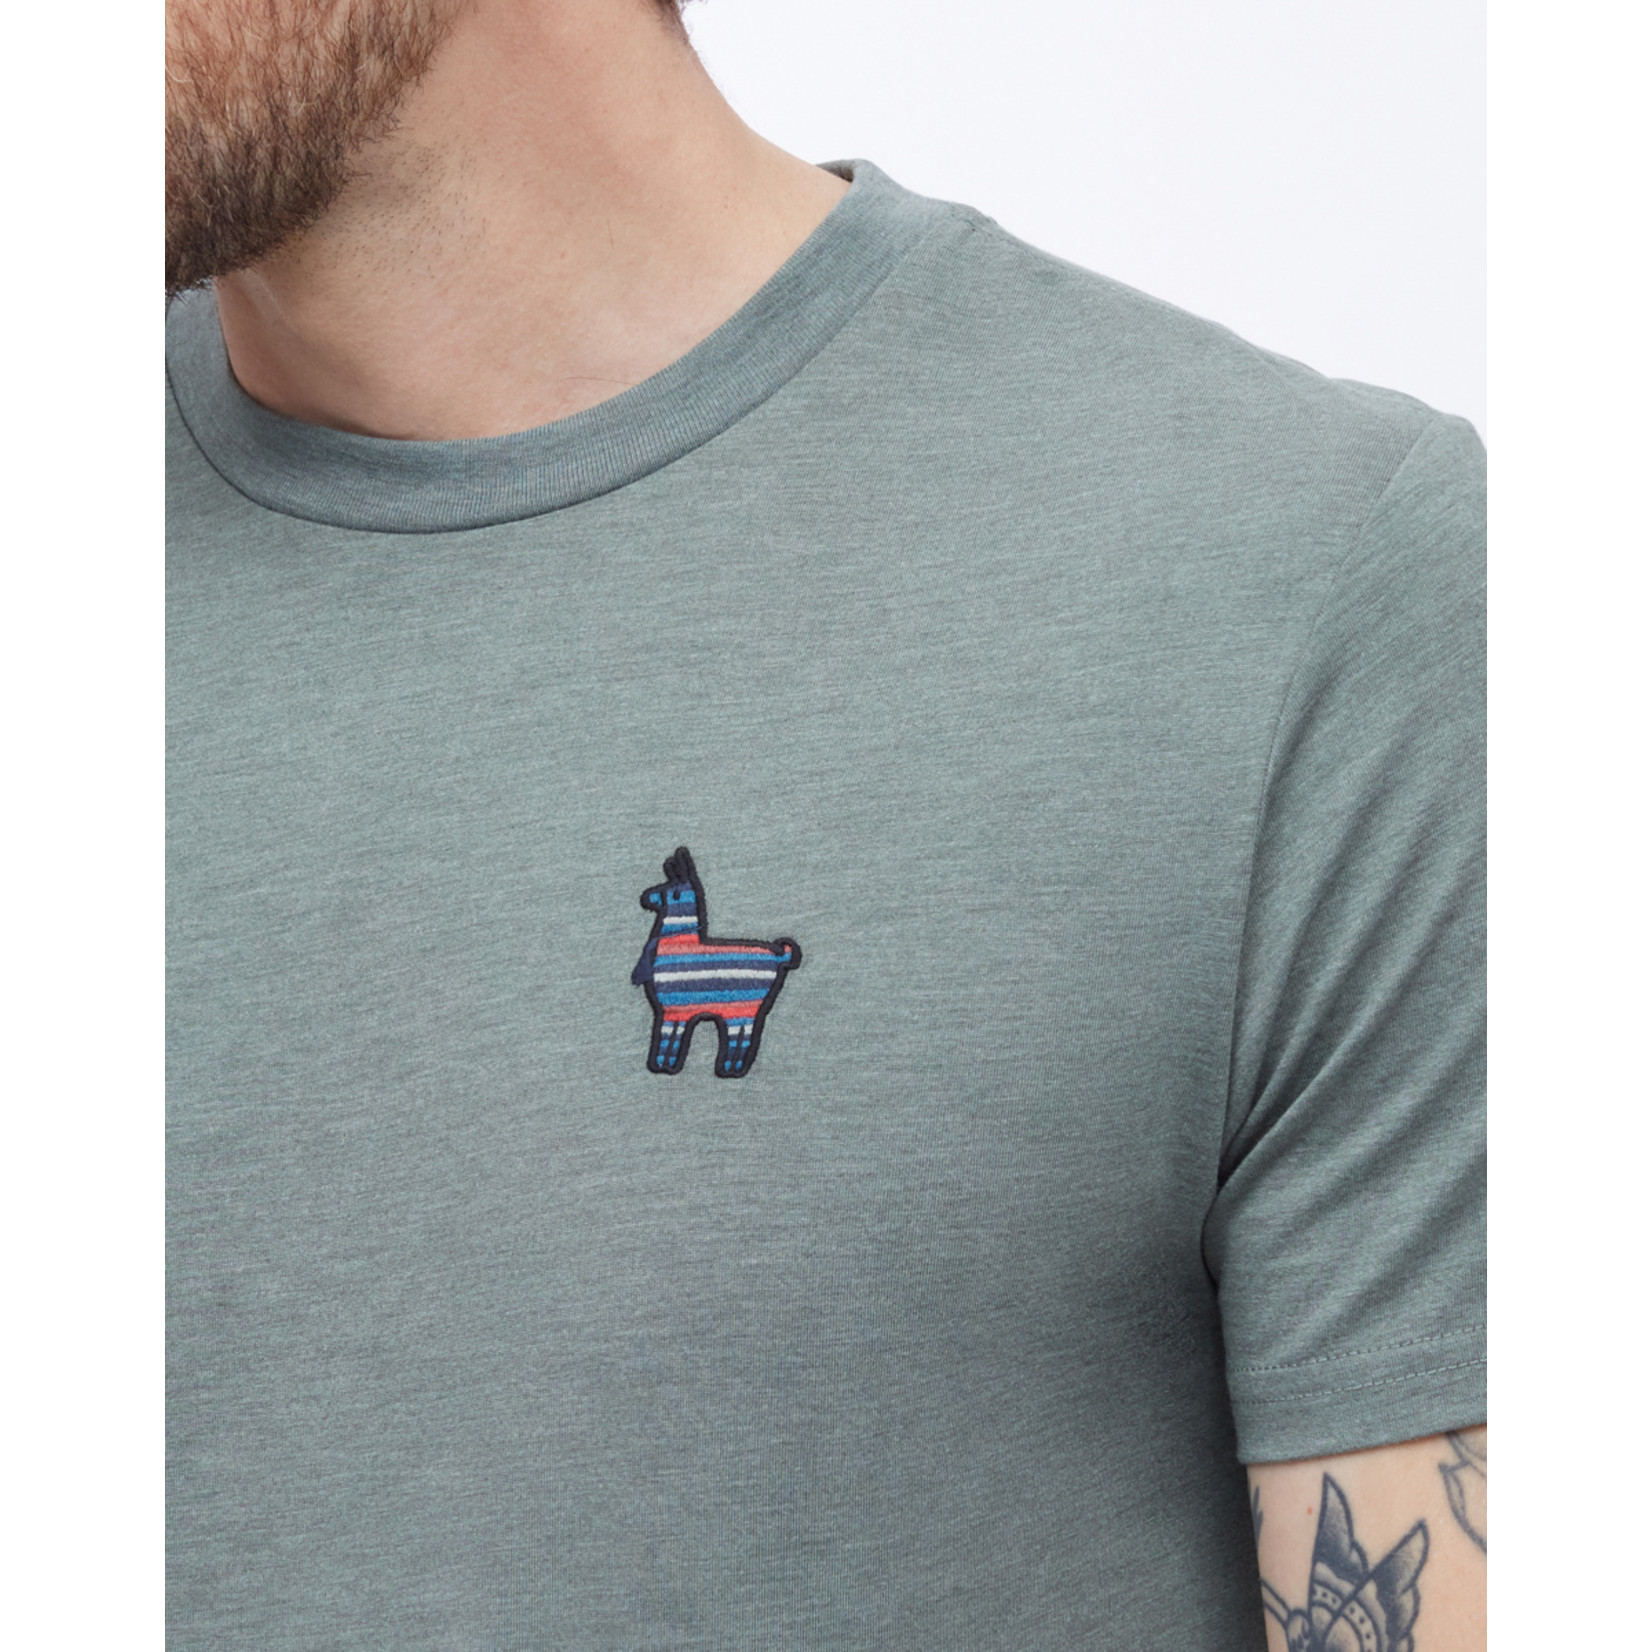 tentree® Peru Embroidered Llama T-Shirt